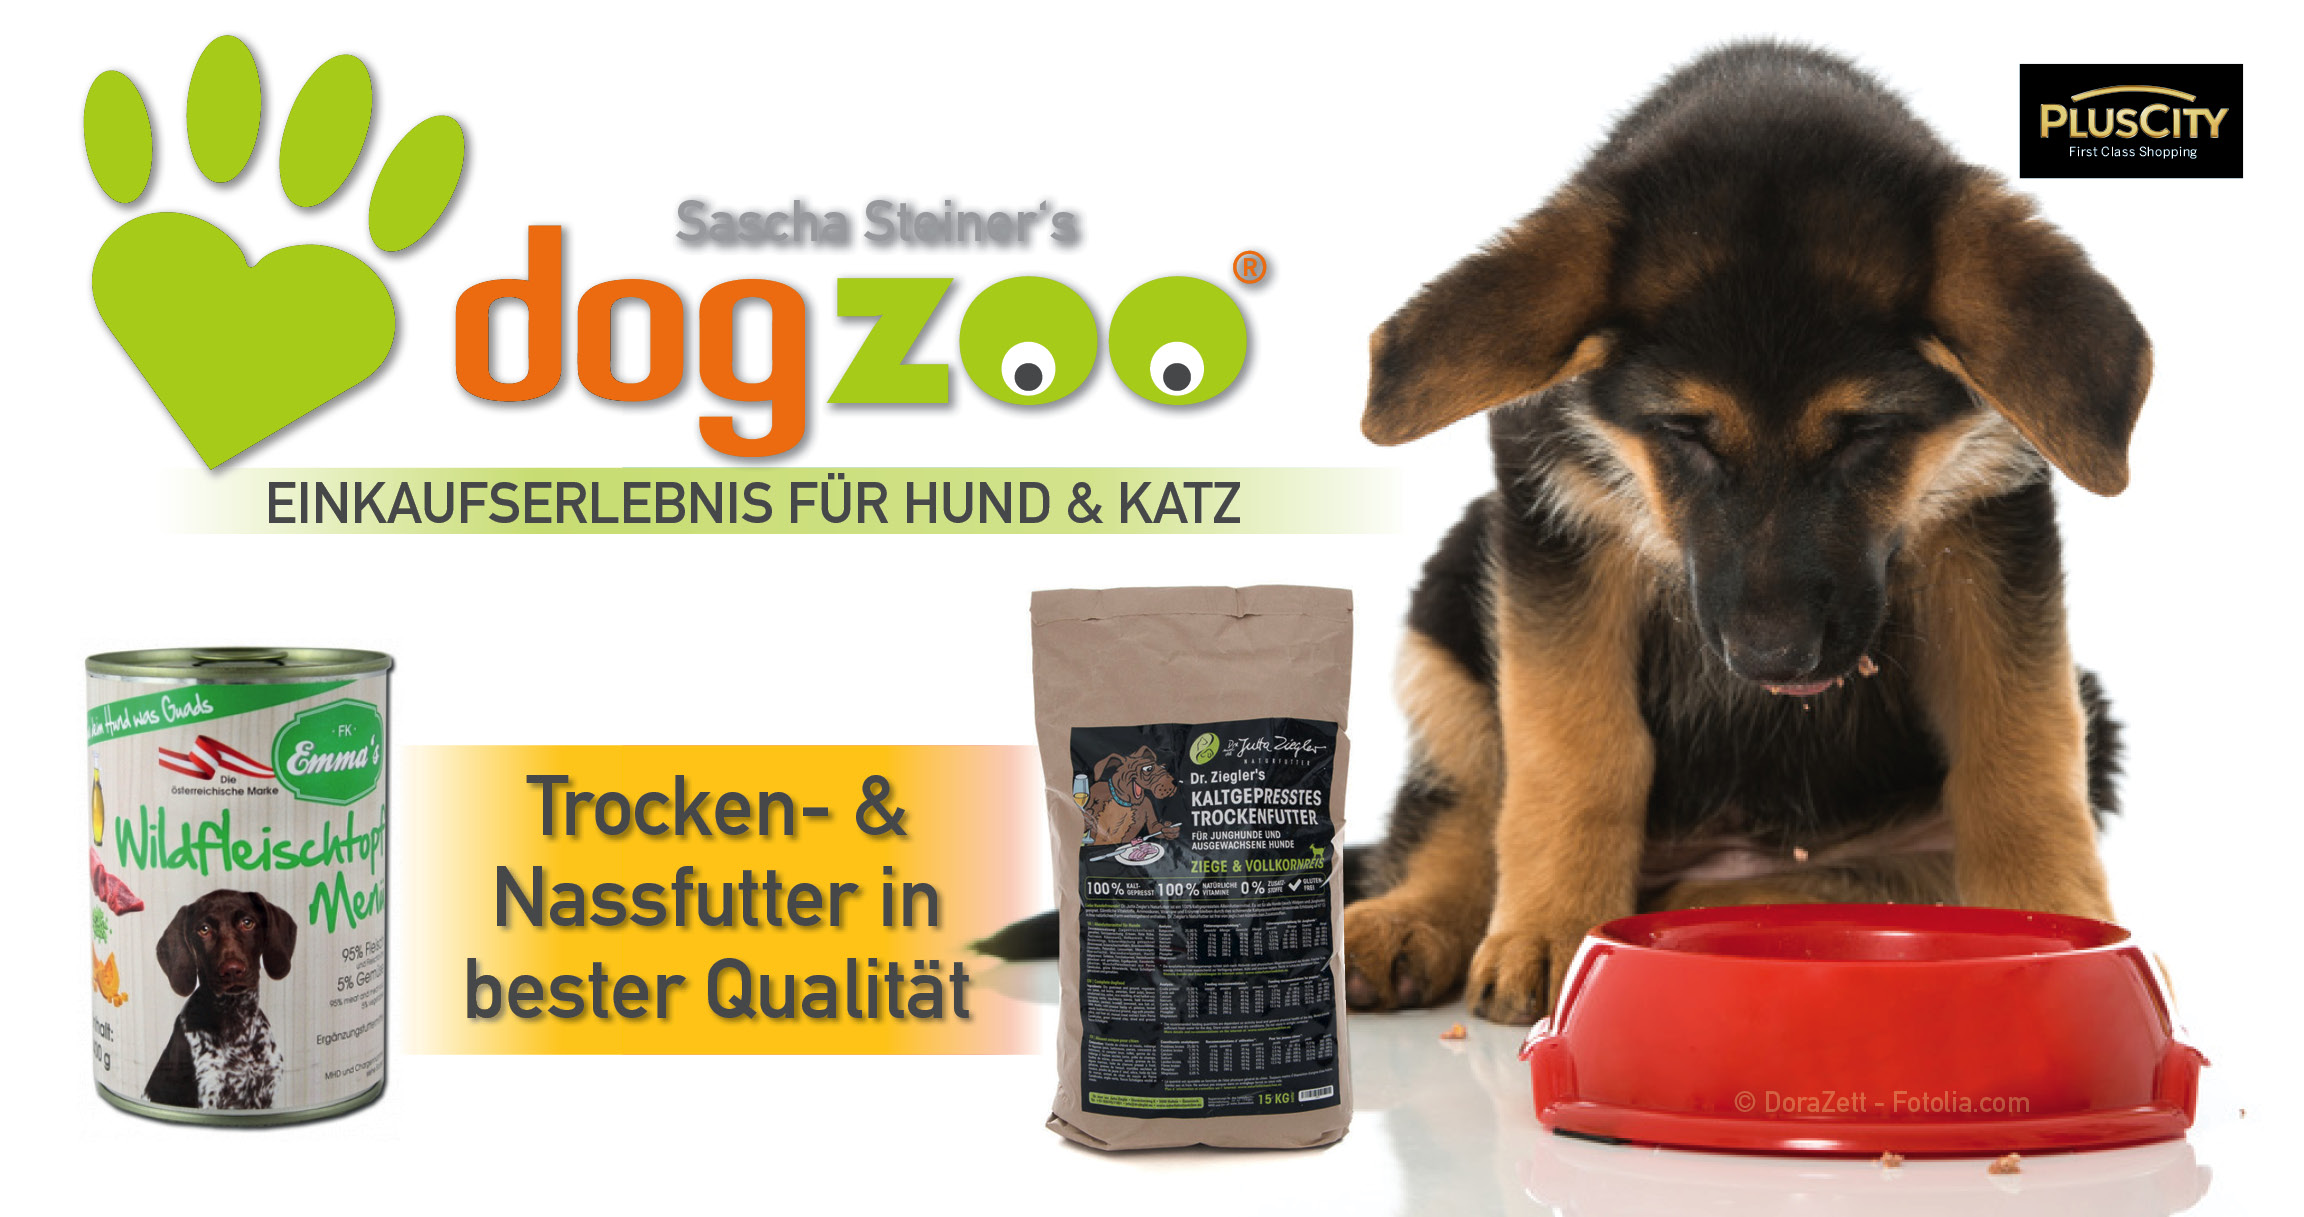 DogZoo